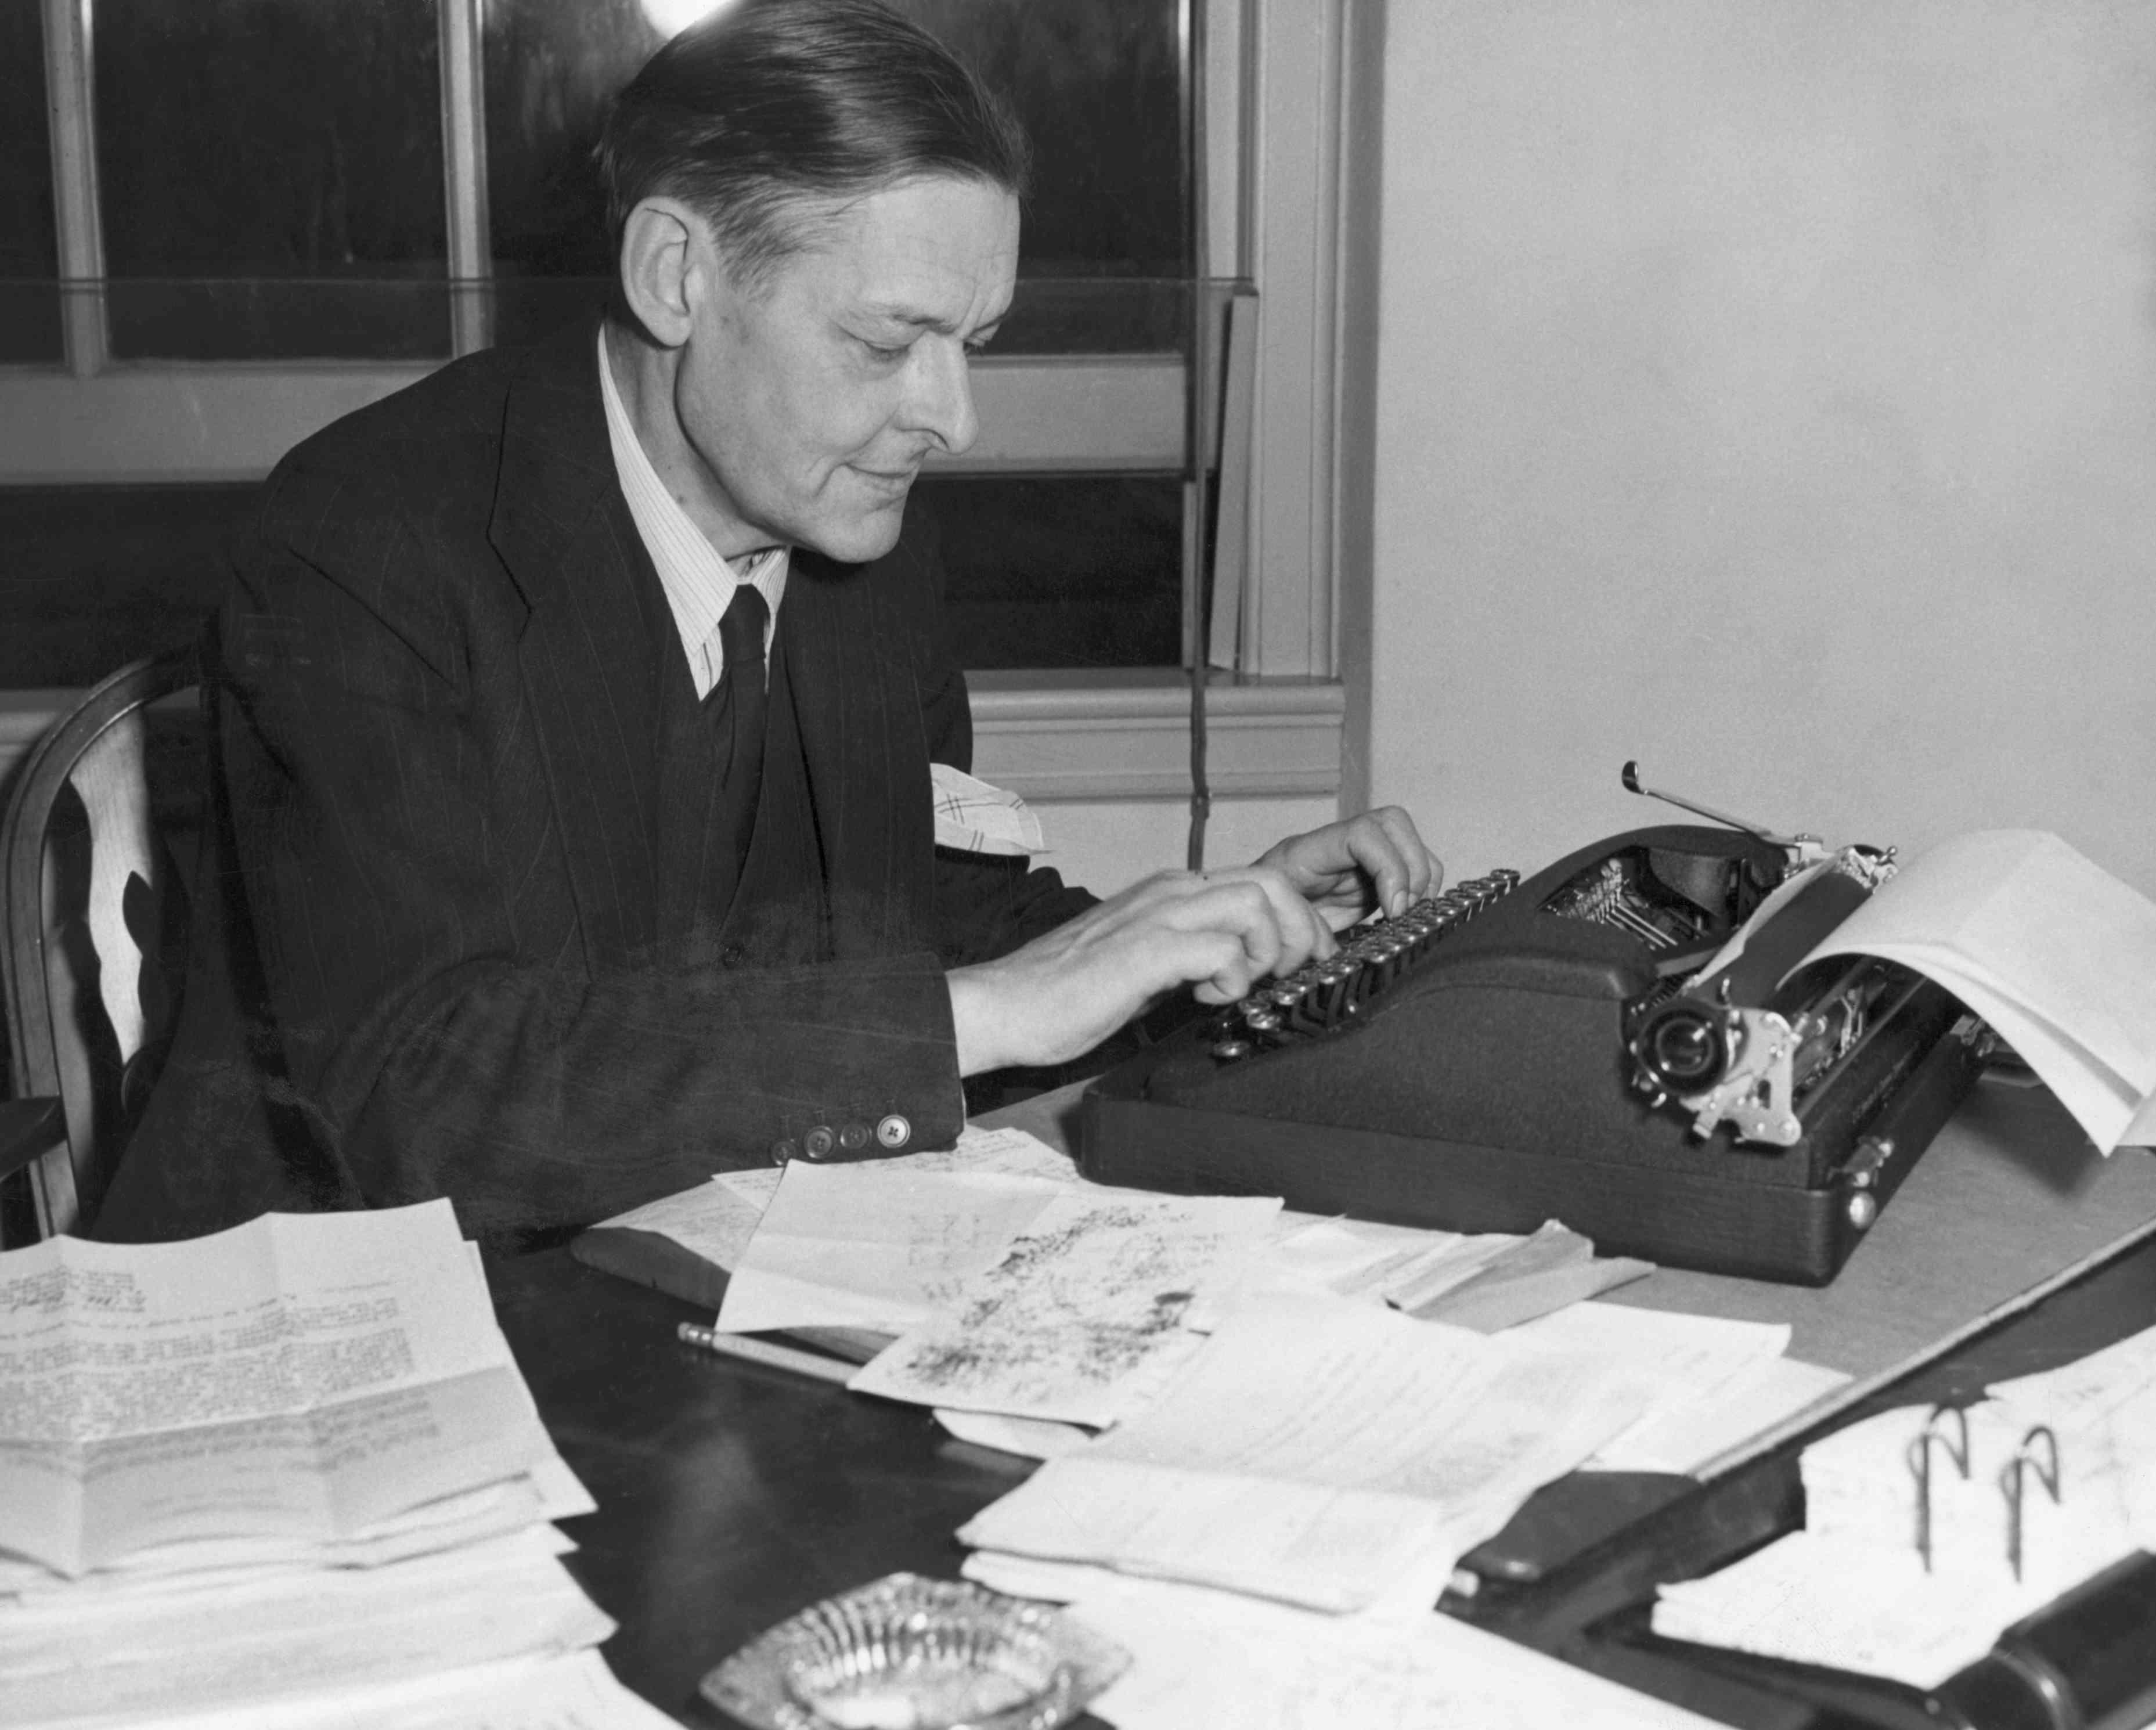 T S Eliot At Desk Inspecting Manuscripts